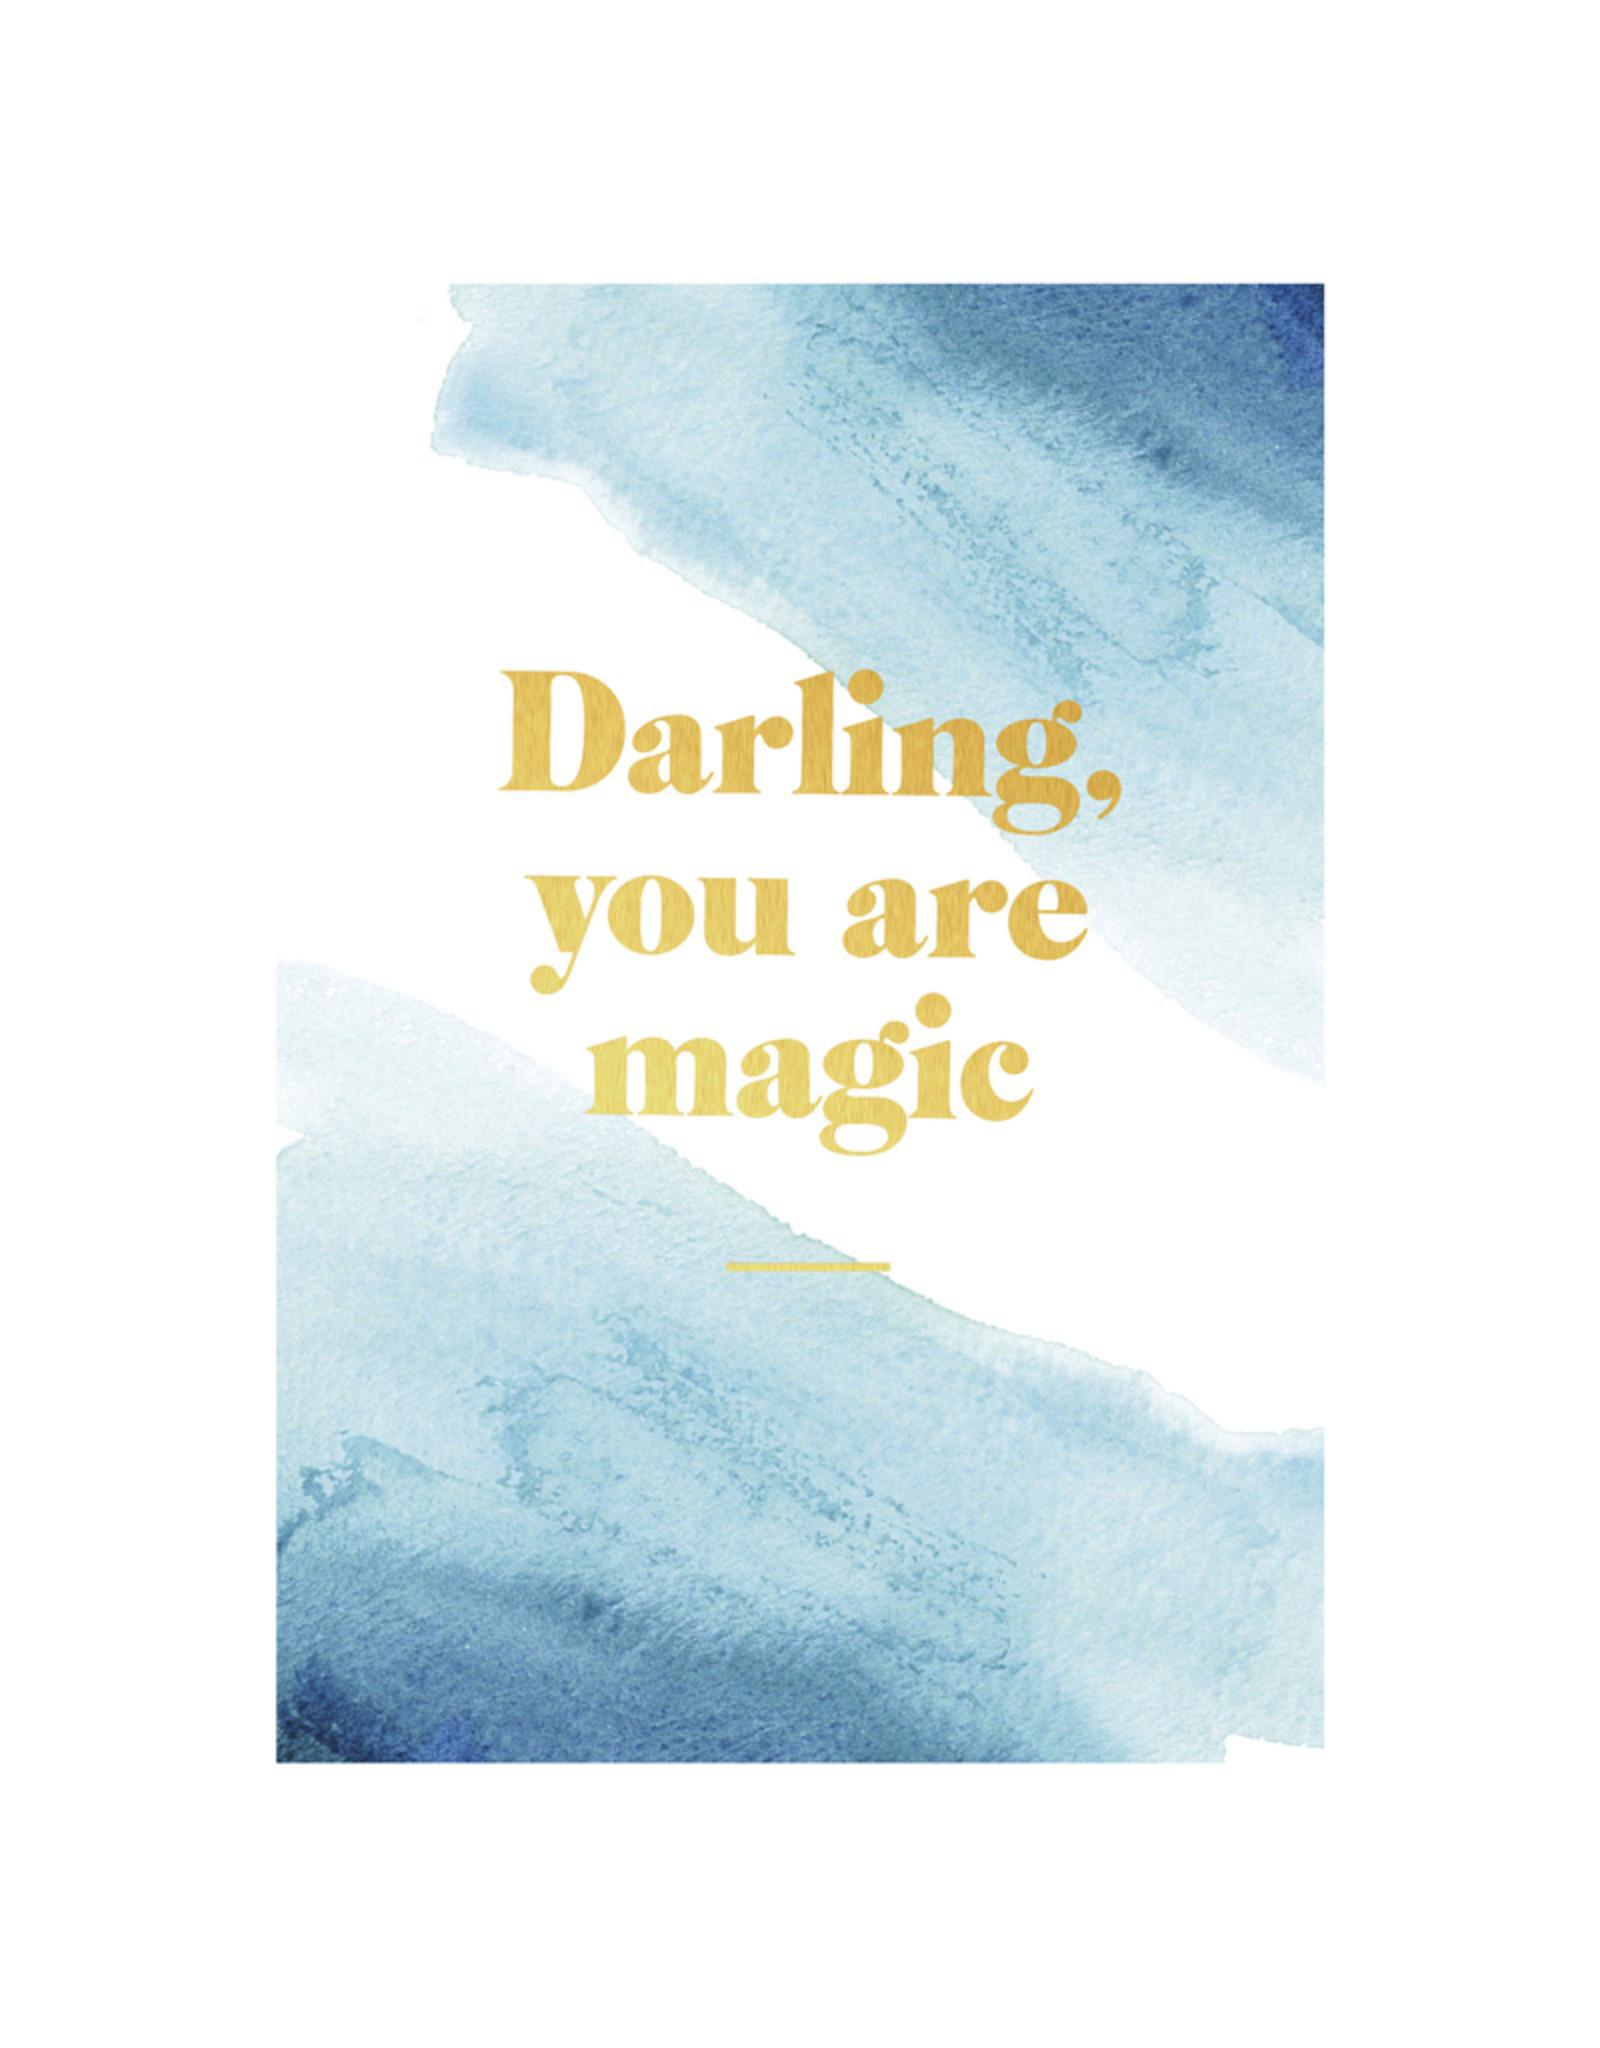 postcard - darling you are magic